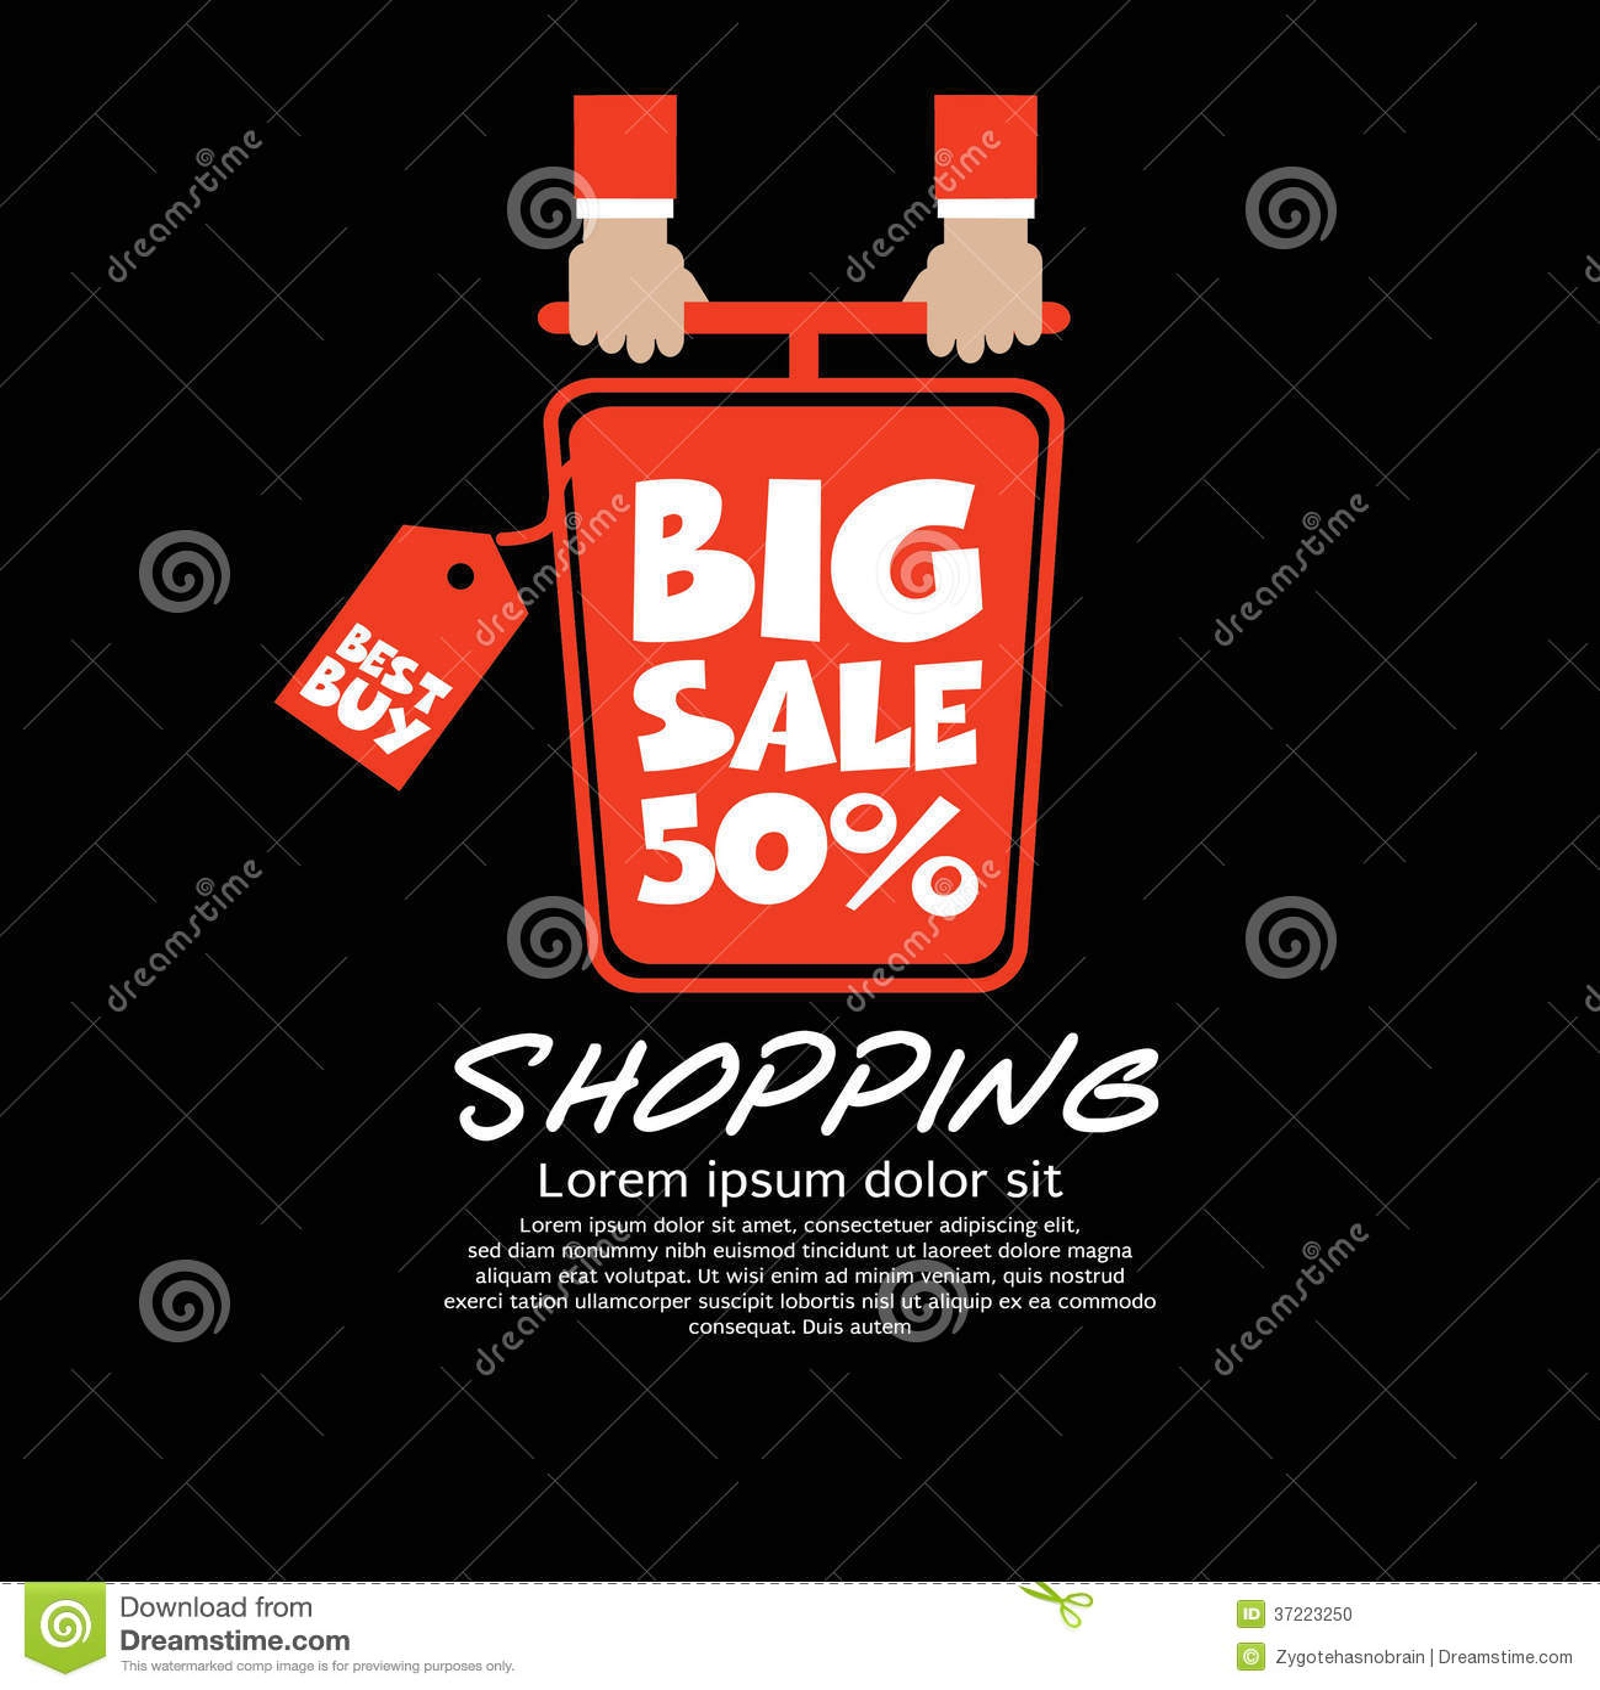 Top View Shopping Cart. Stock Photo - Image: 37223250